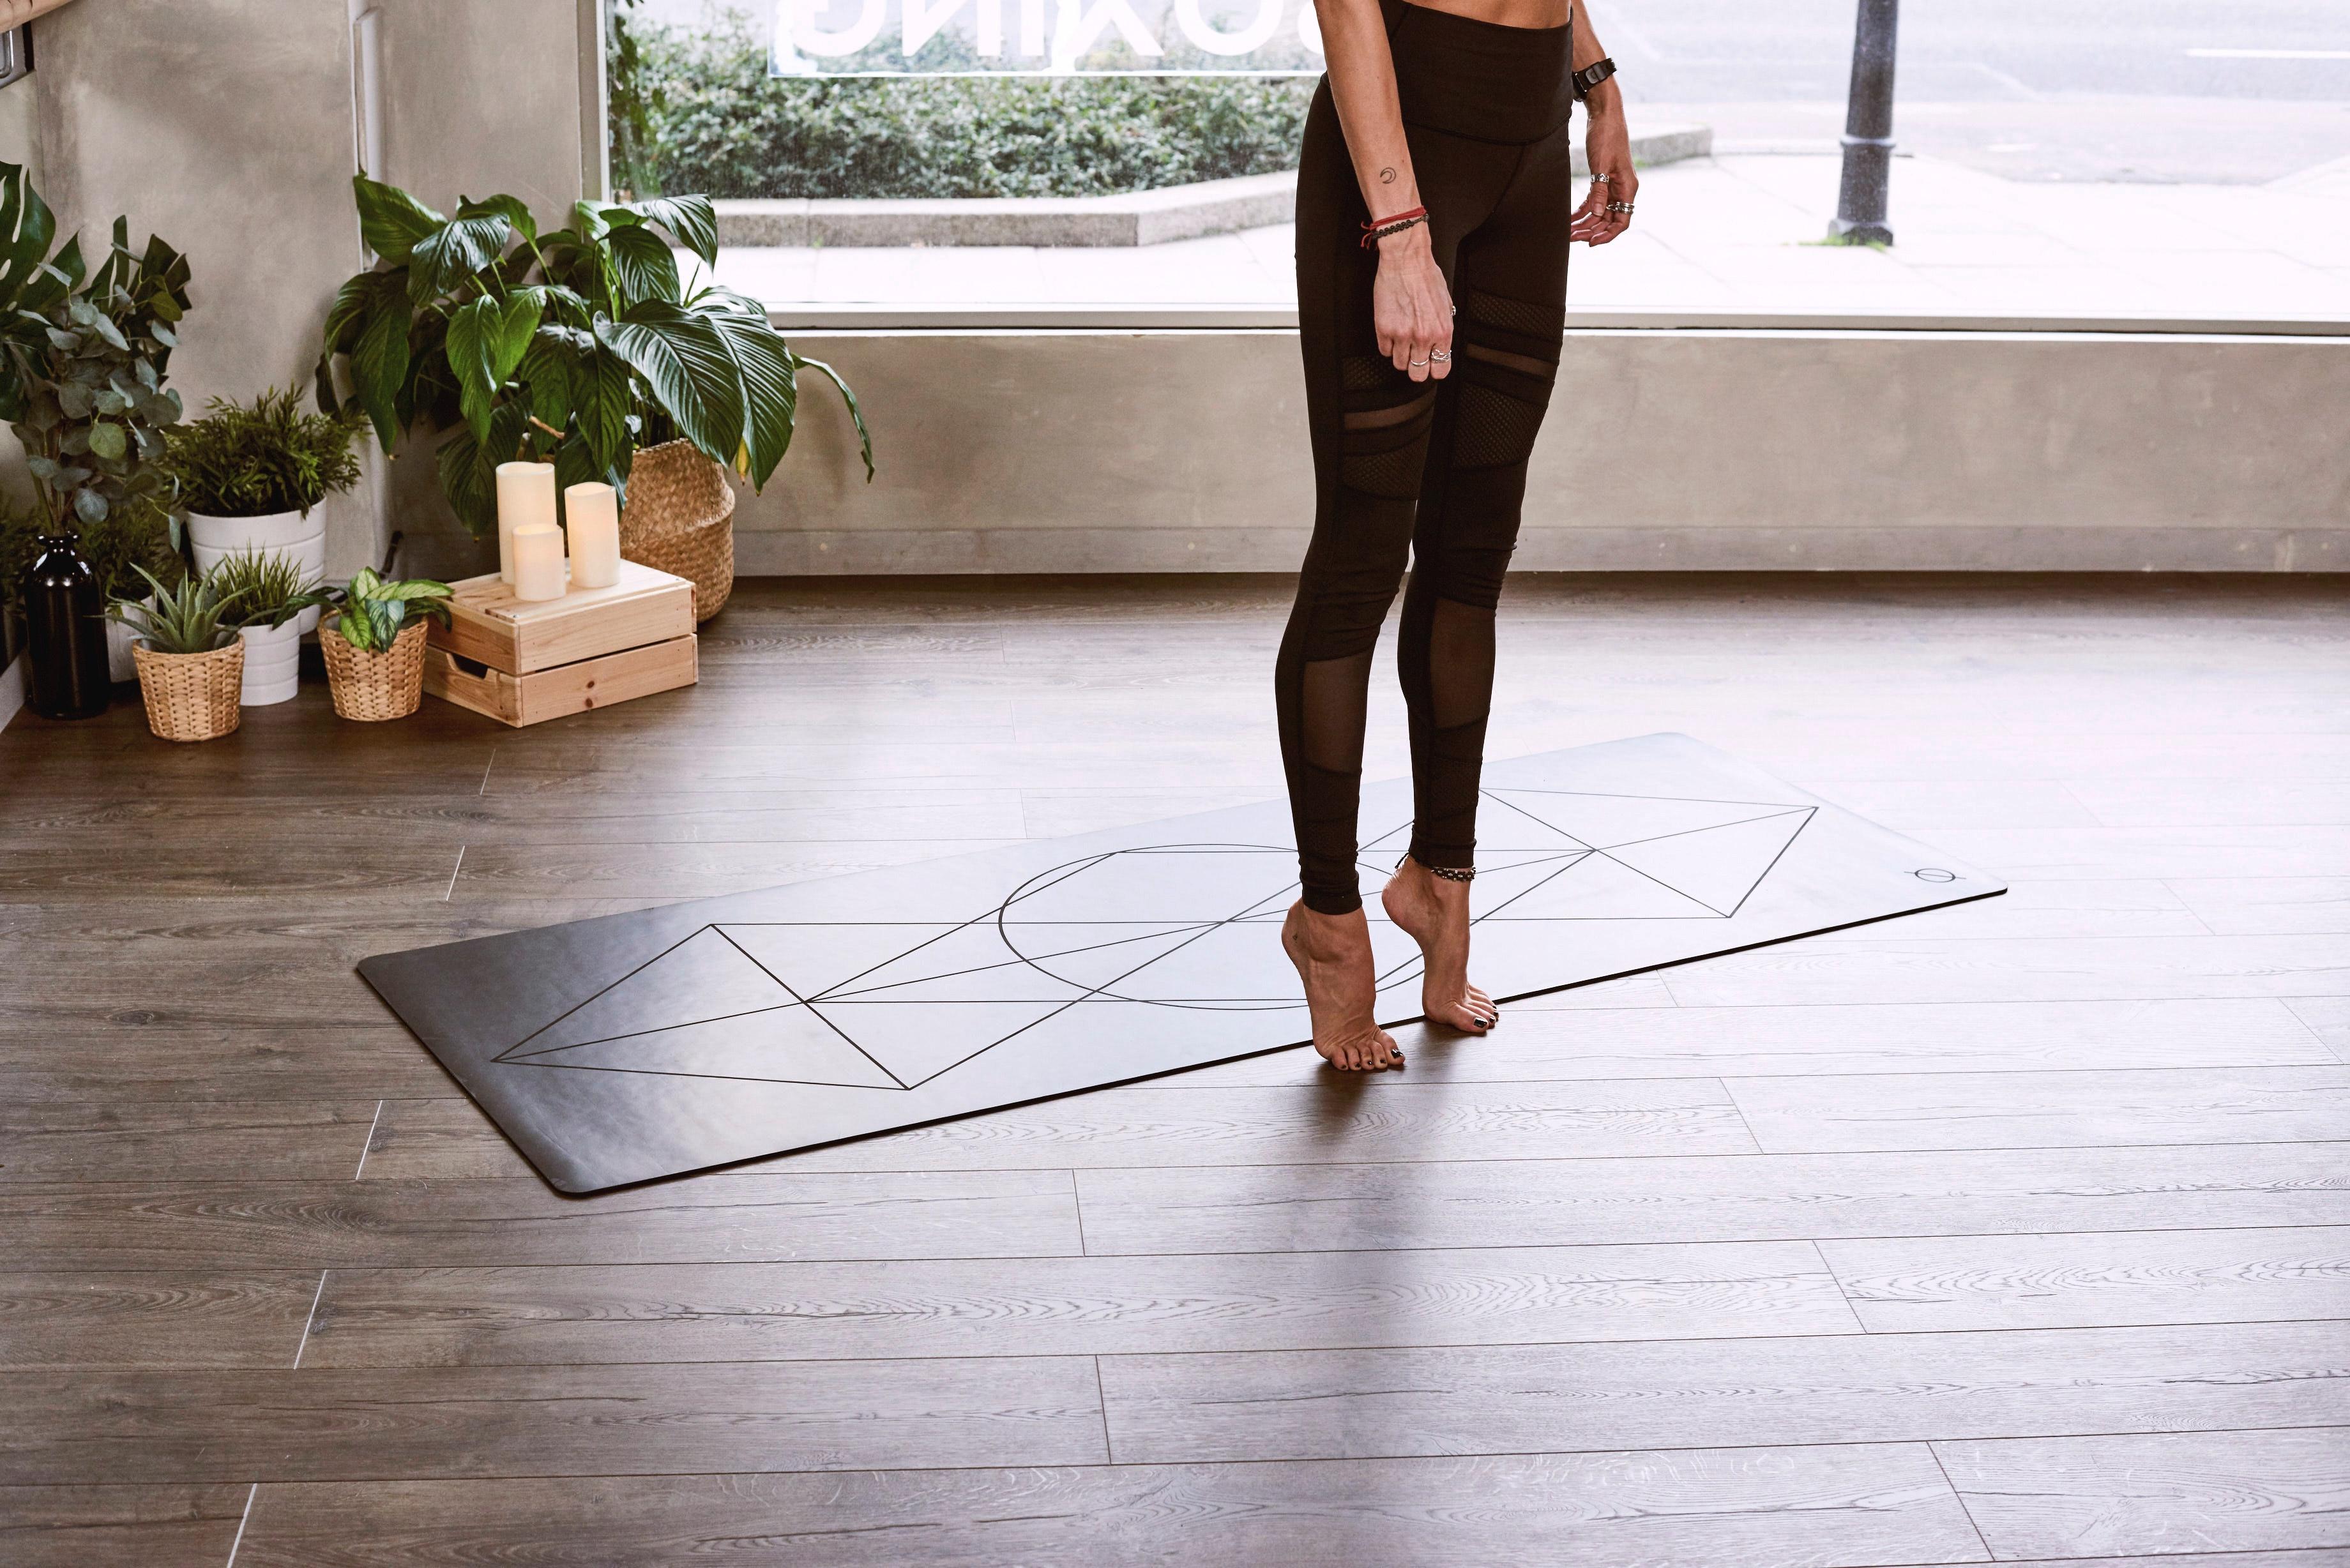 woman-tip-toeing-on-floor-1882003